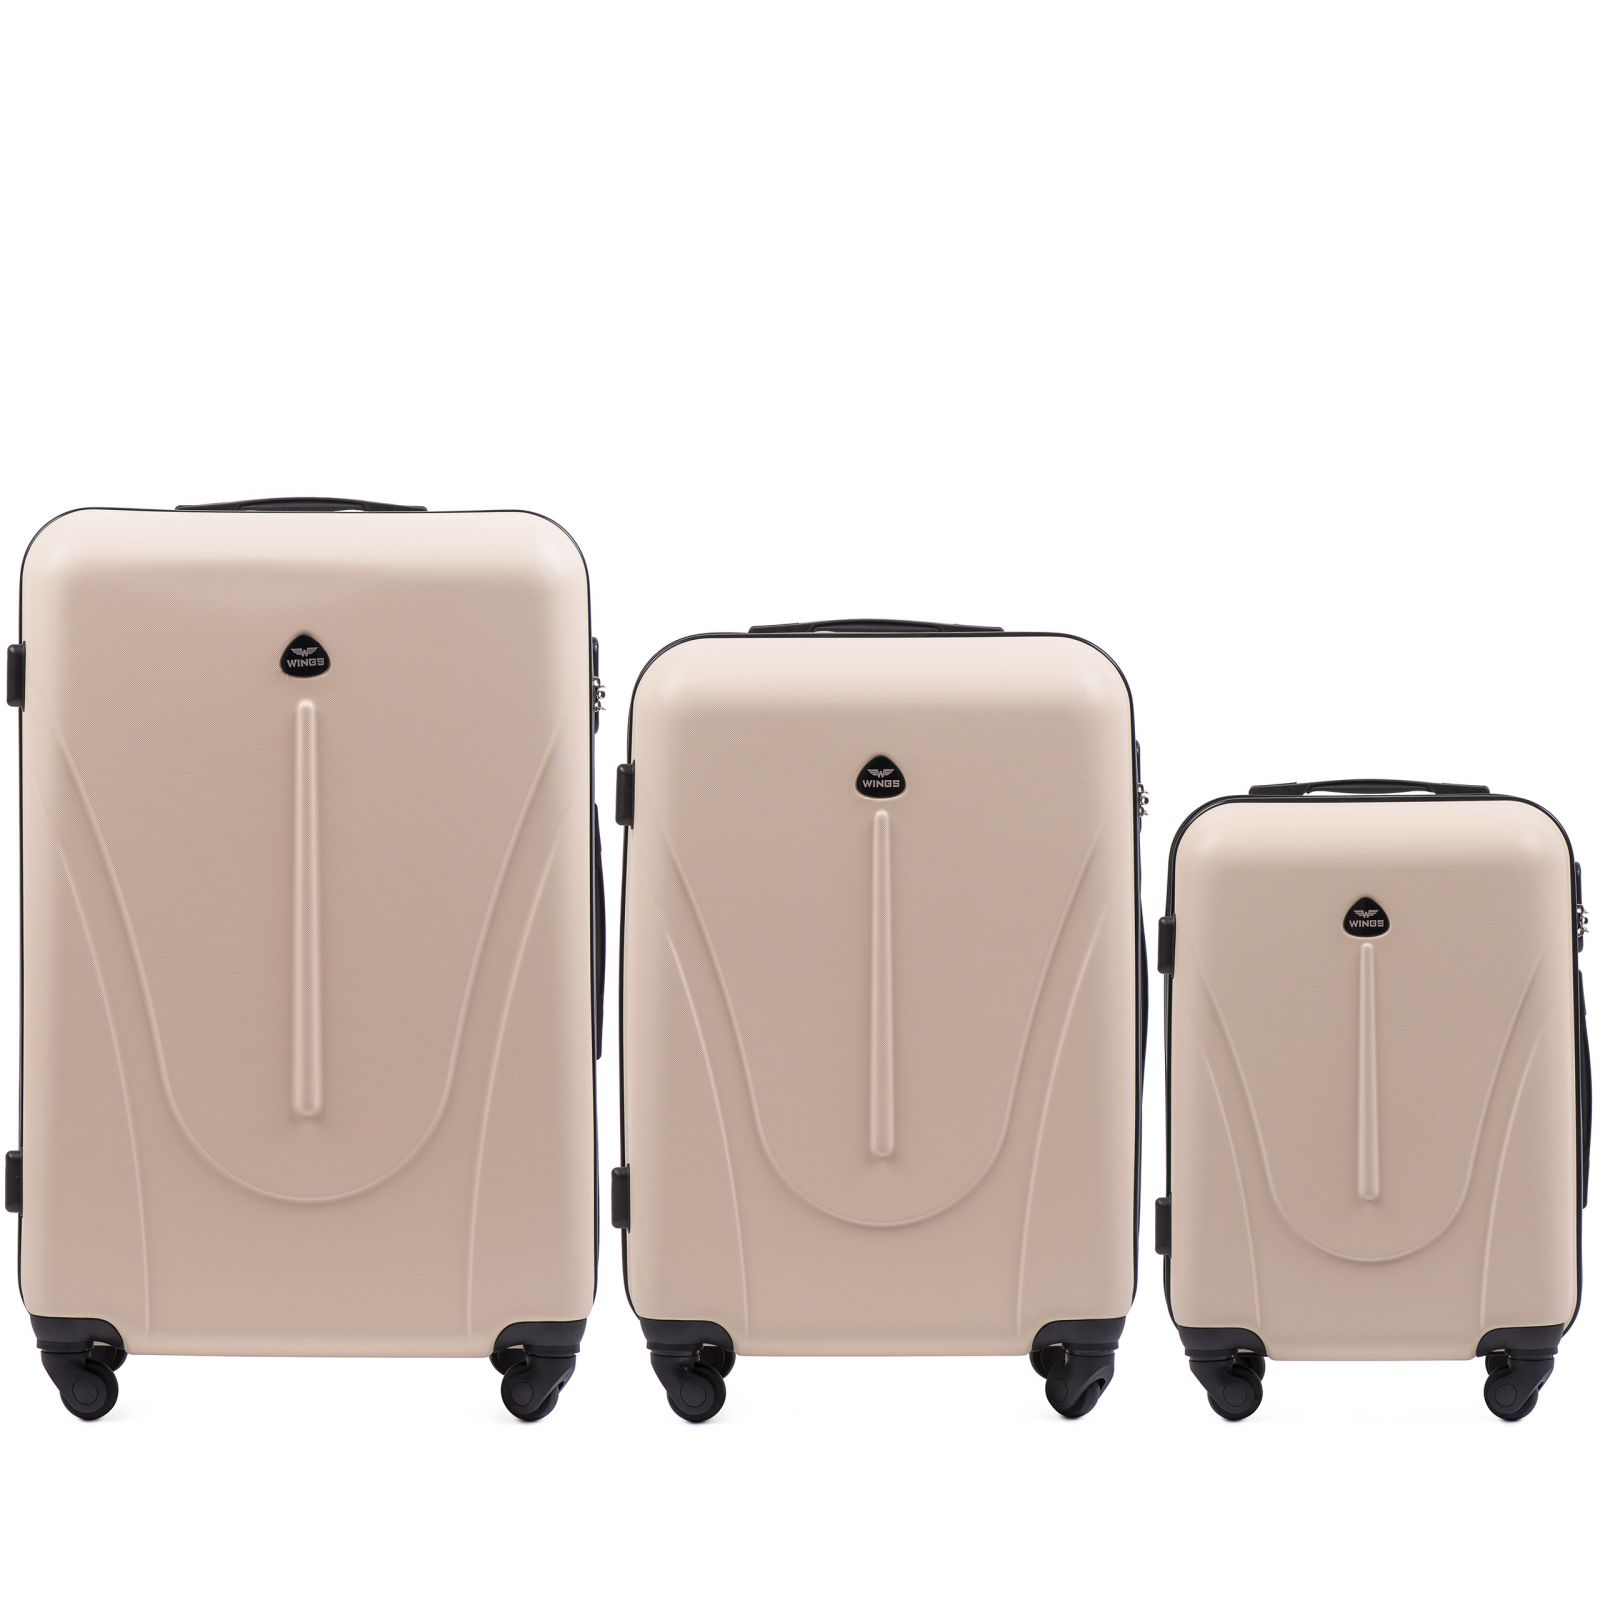 Cestovní kufry sada WINGS 888 ABS DIRTY WHITE L,M,S E-batoh